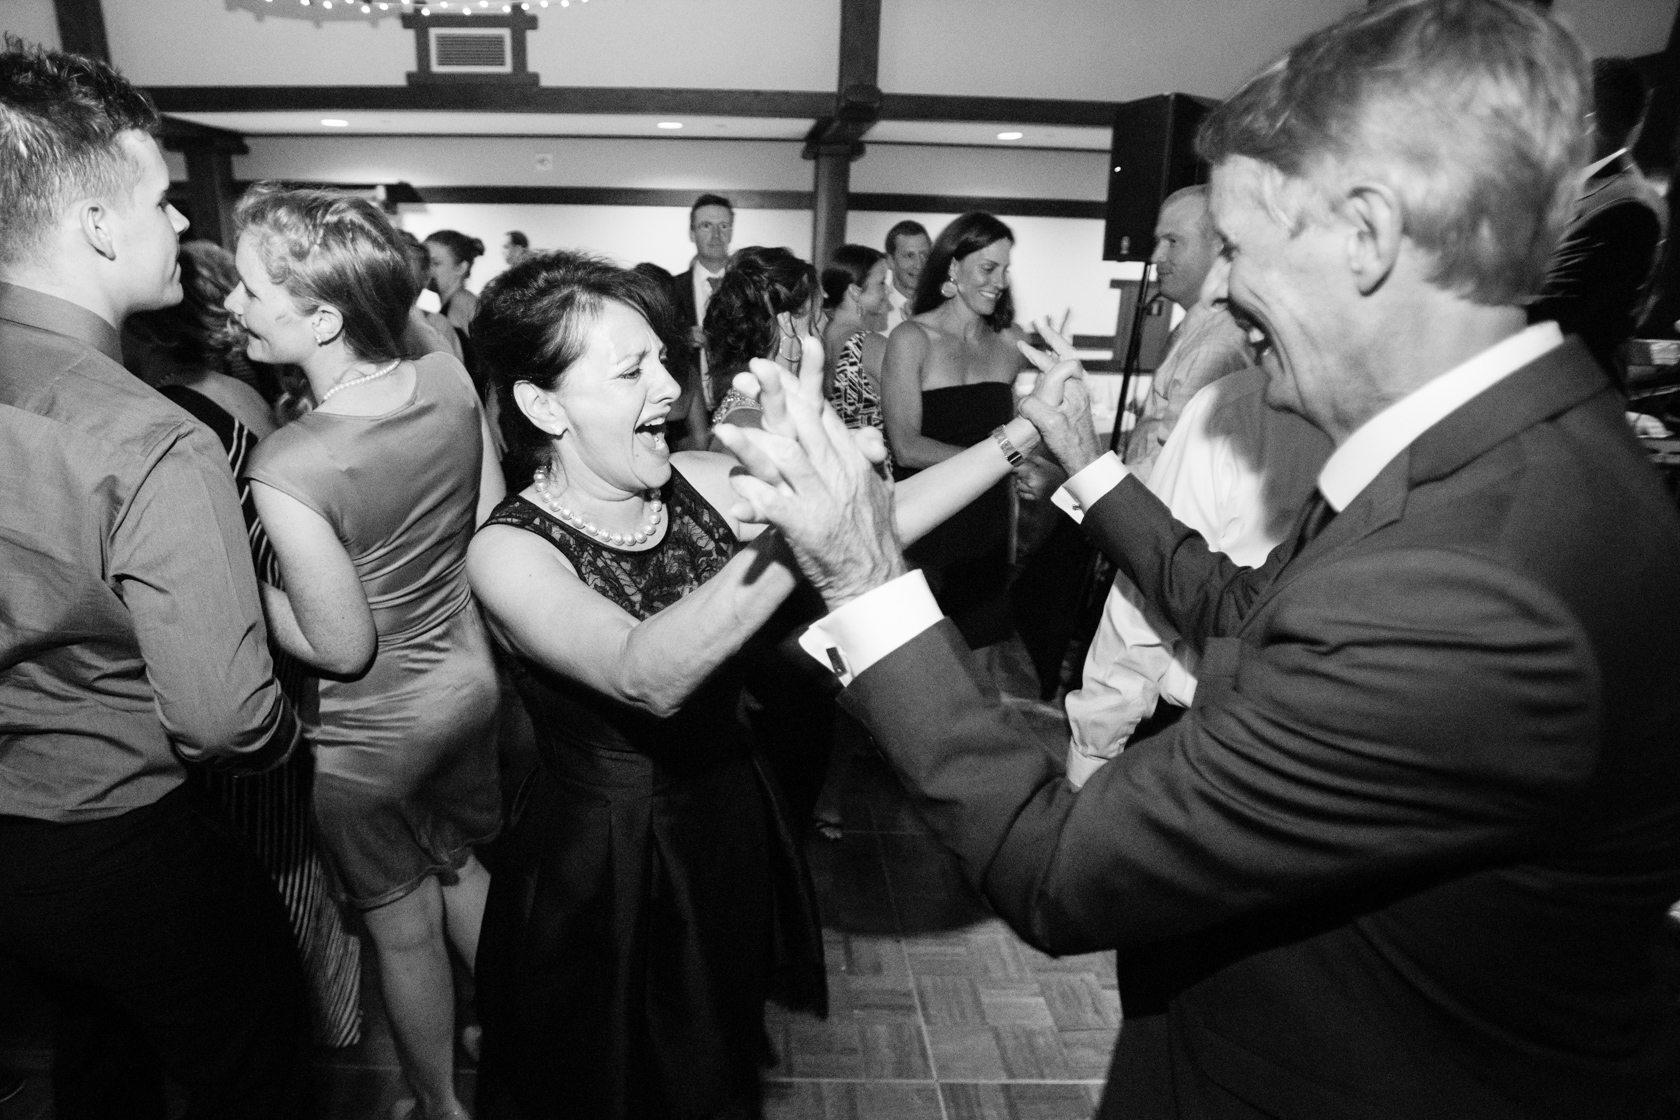 The_Lodge_at_Torrey_Pines_Wedding_118.jpg